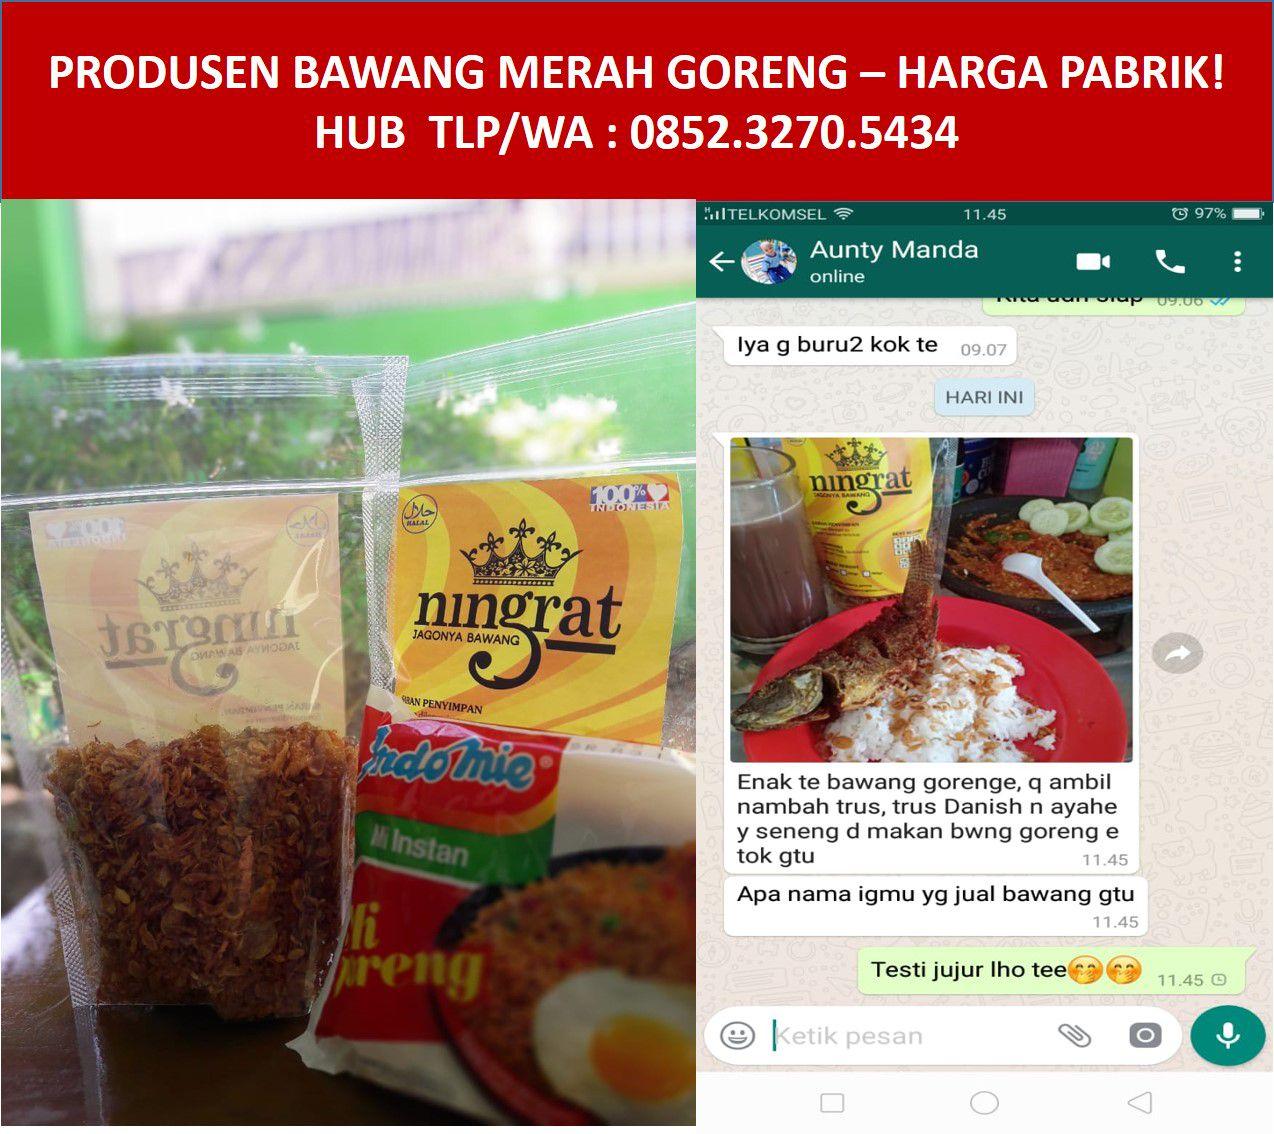 Jual Bawang Goreng Hemat Termurah 2018 Atteenahijab Atiqa Raudha Hijau Pucuk Harga Pabrik Oven Surabaya 085232705434 Bandung Distributor Jakarta Onion Online Organik Original